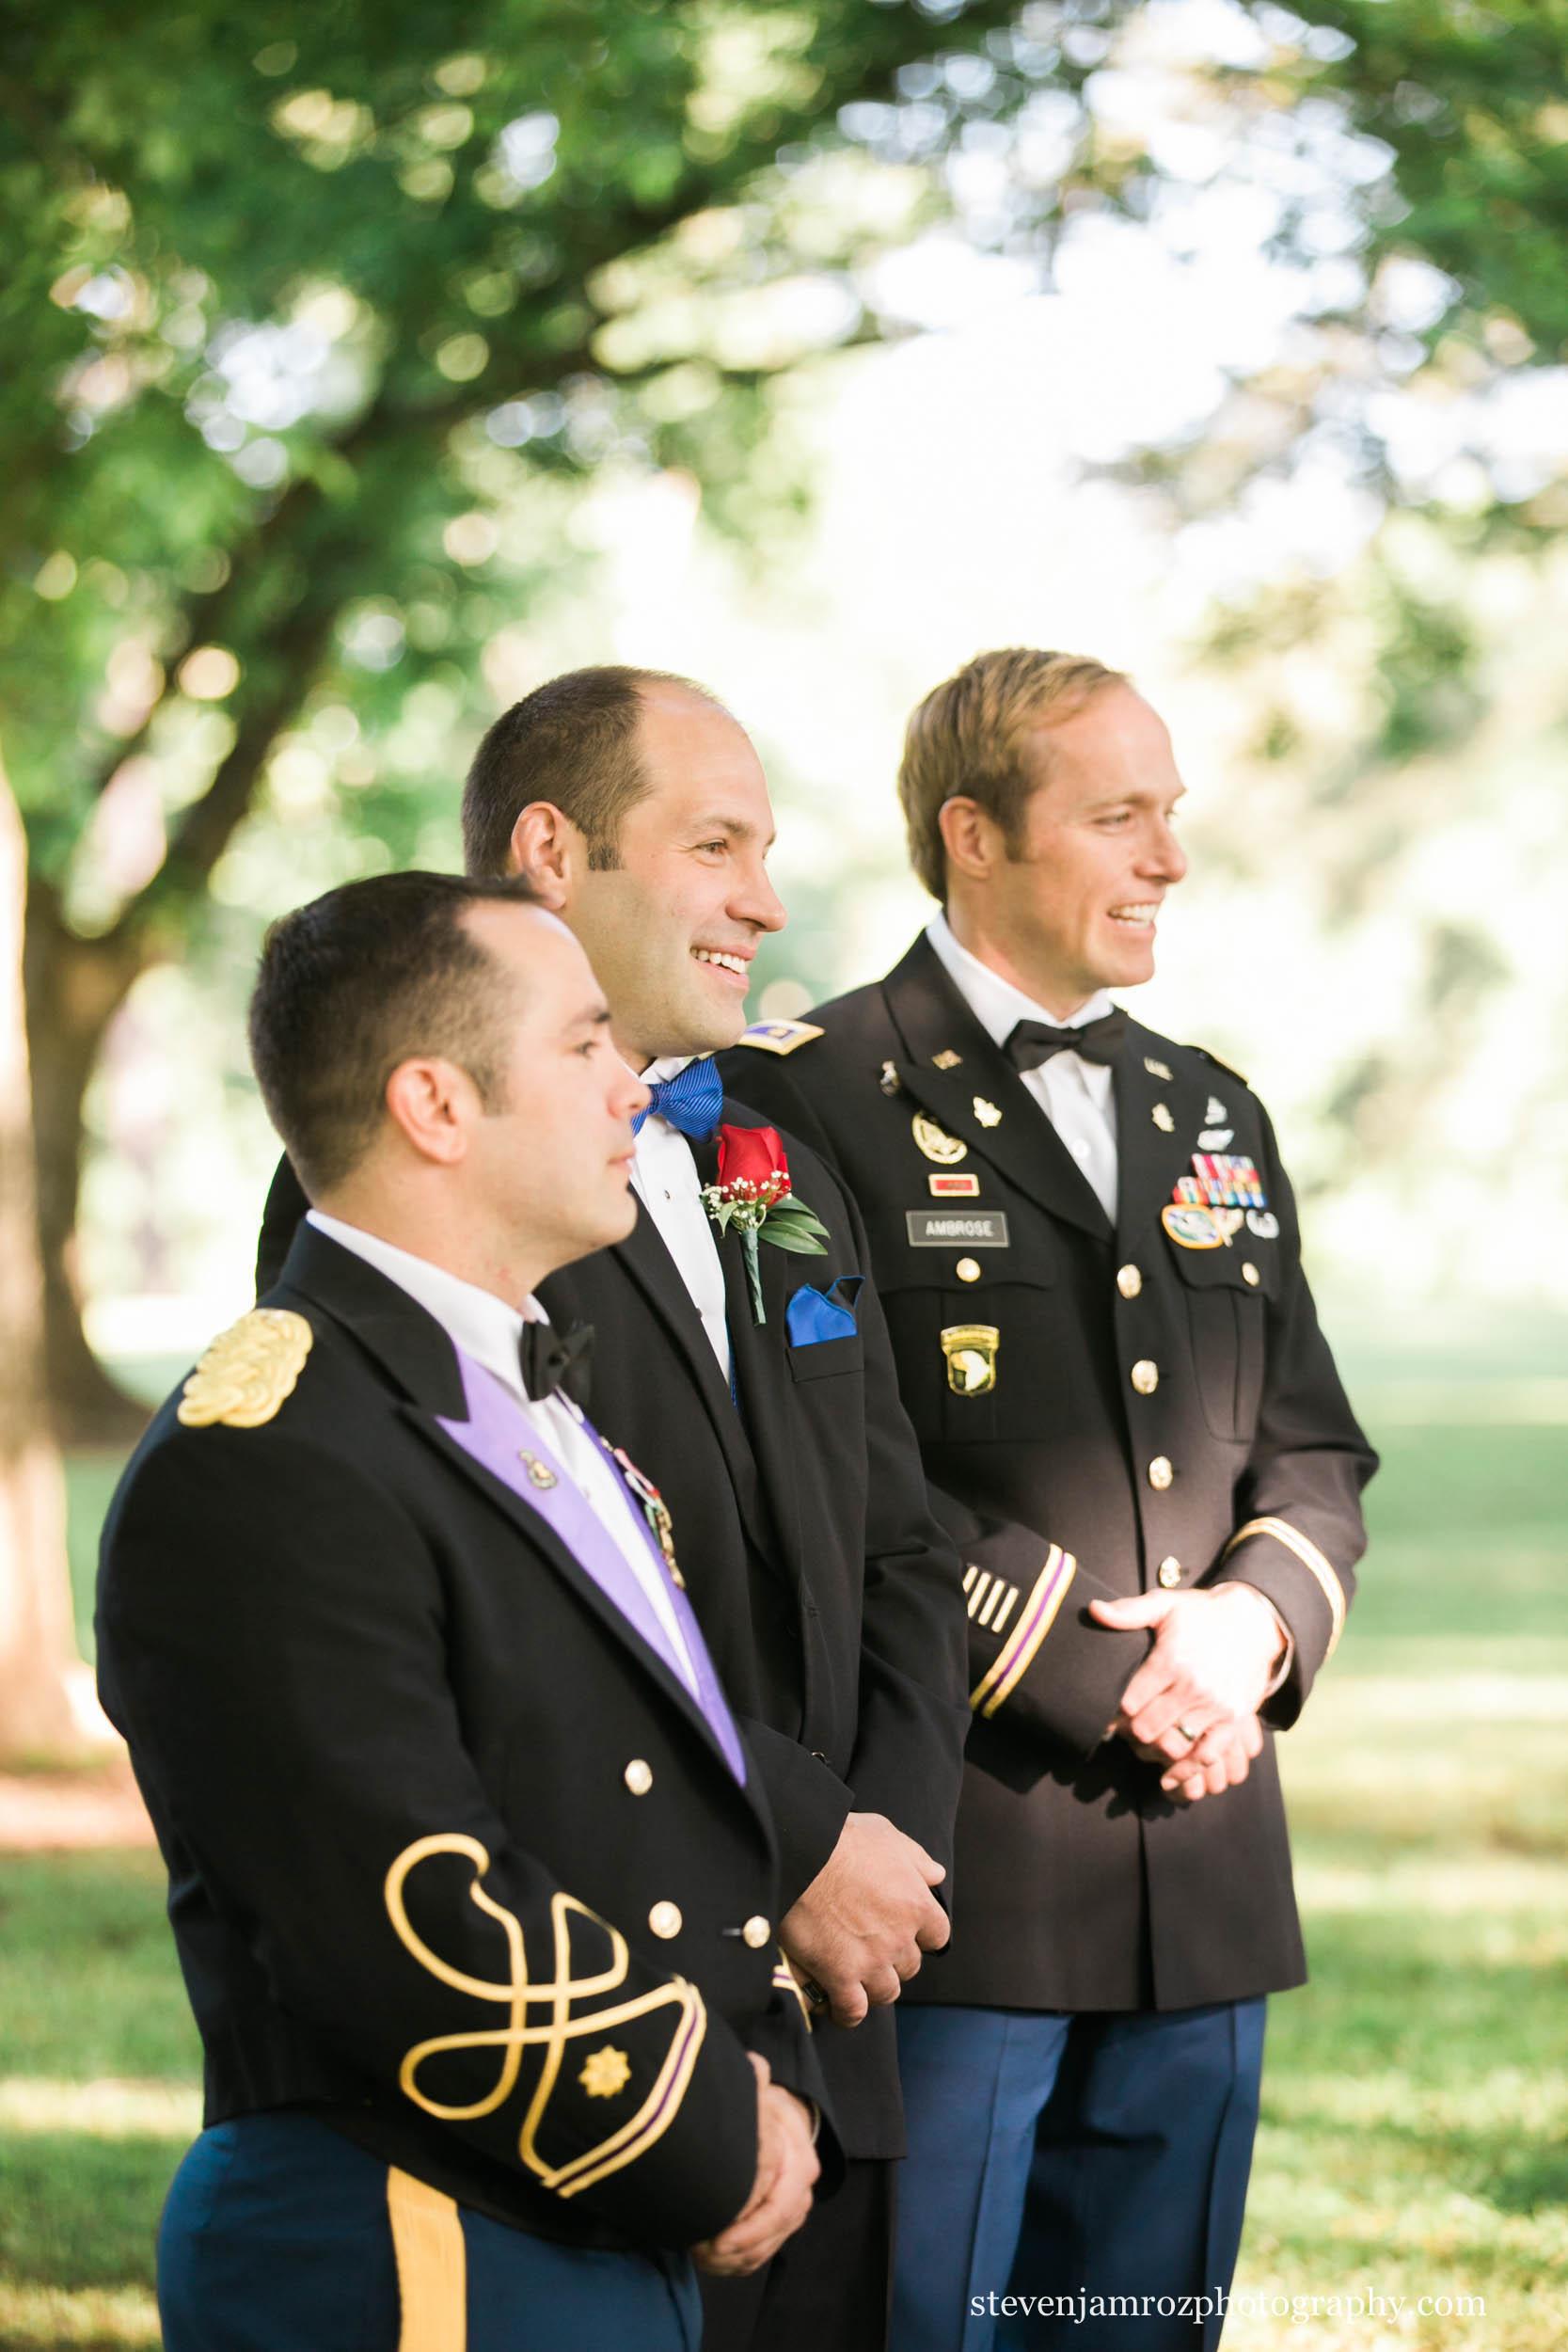 magnolia-manor-wedding-ceremony-photographer-steven-jamroz-0655.jpg